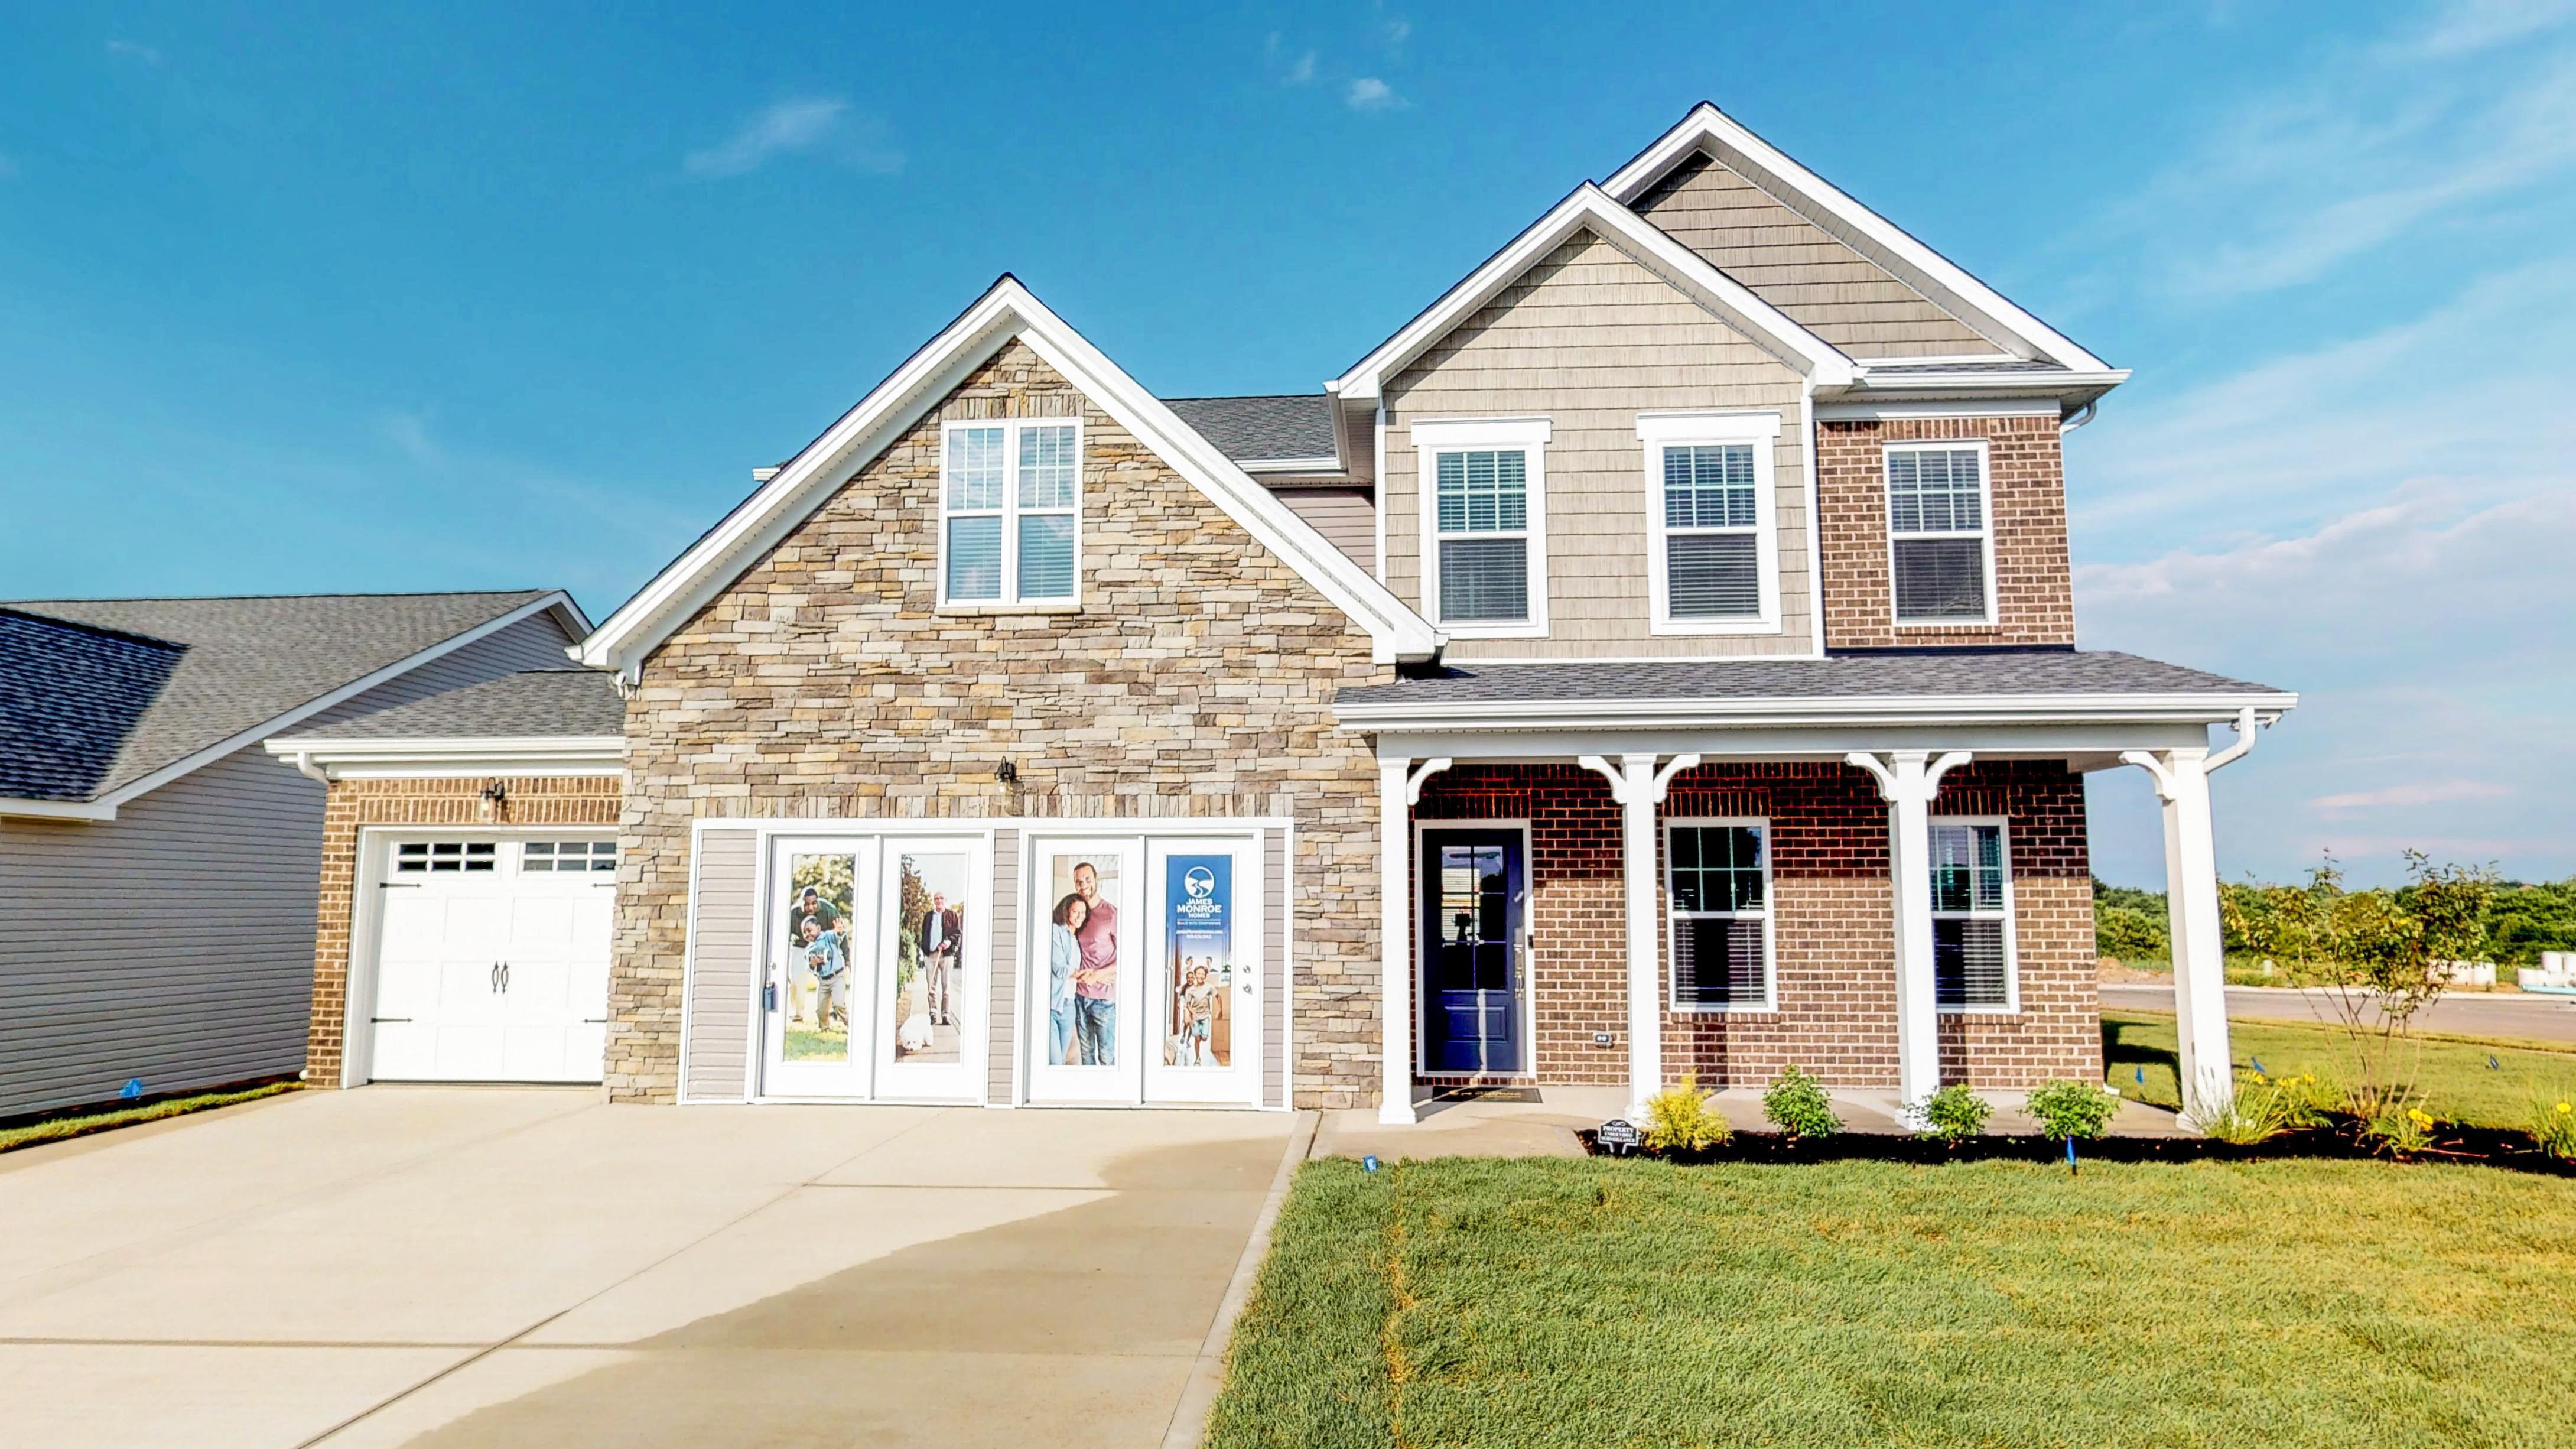 'Willow Oak' by James Monroe Homes in Lexington